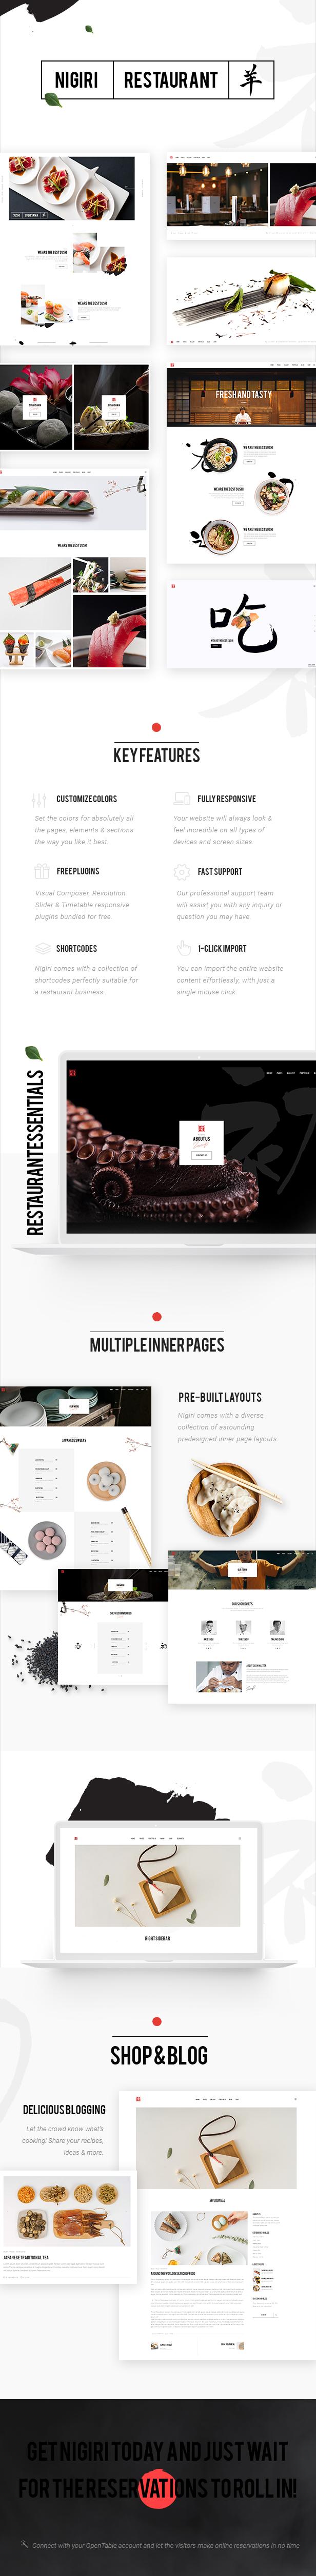 Nigiri - A Modern Restaurant WordPress Theme - 1